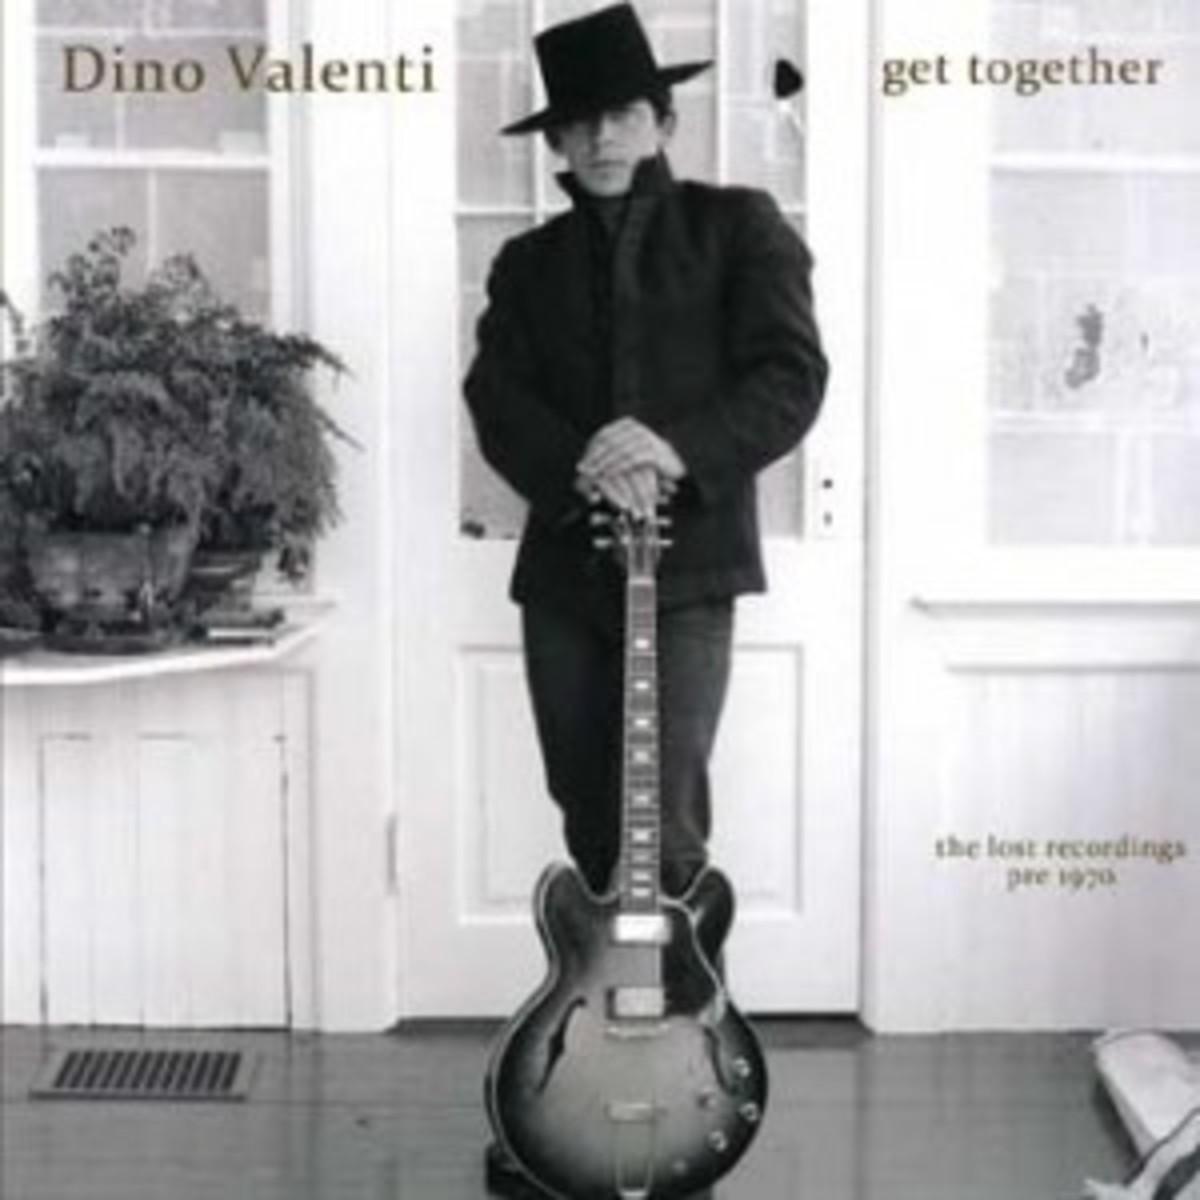 Dino_Valenti_Get_Together